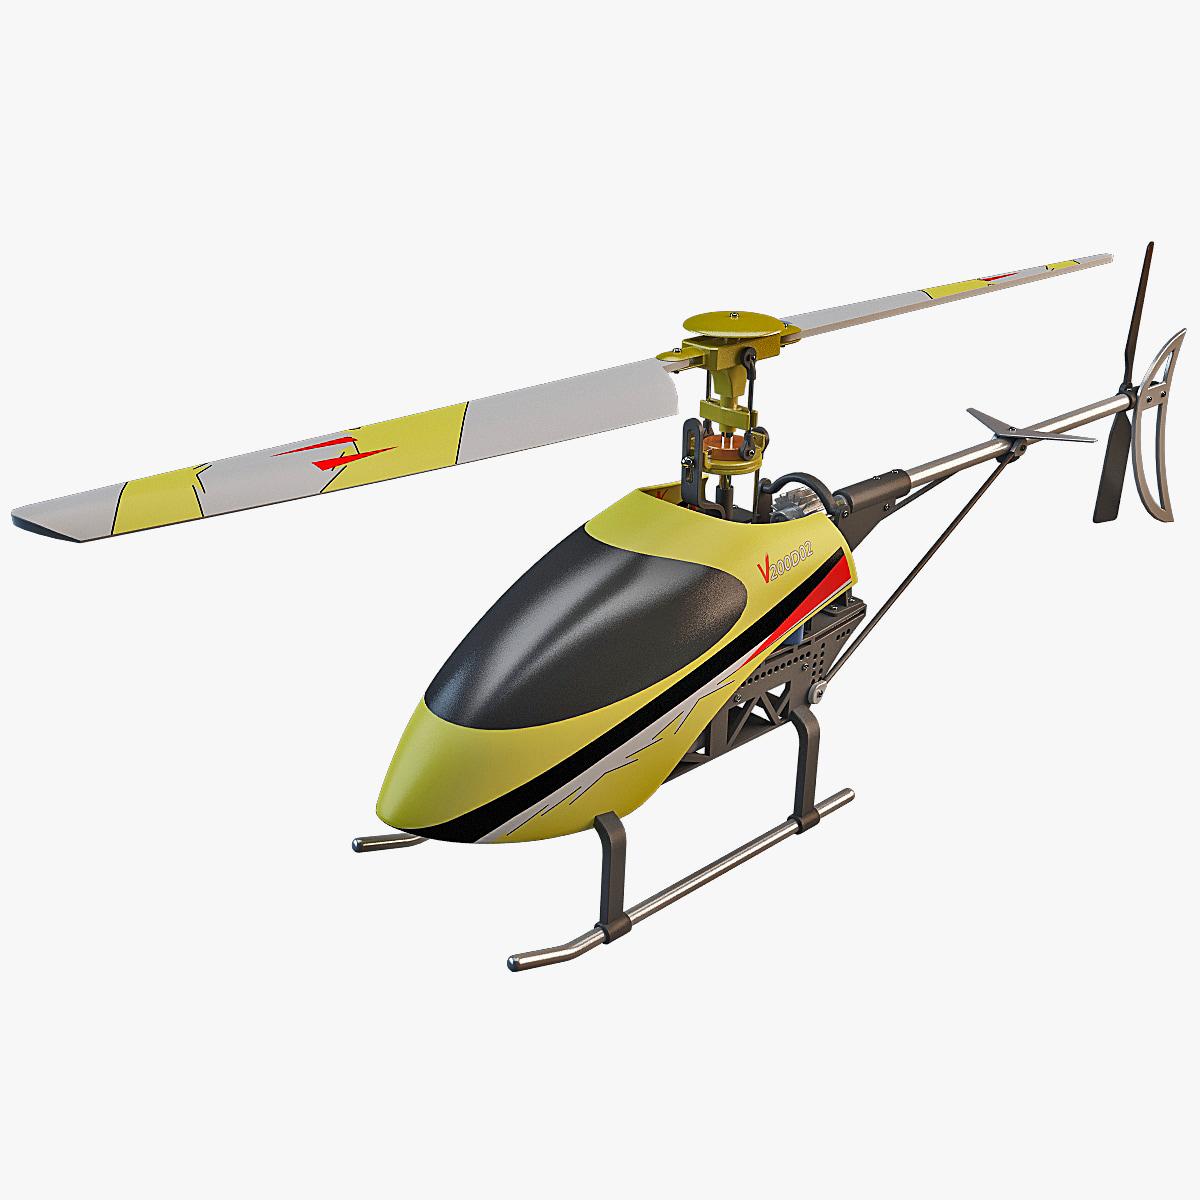 Mini_Helicopter_Walkera_000.jpg